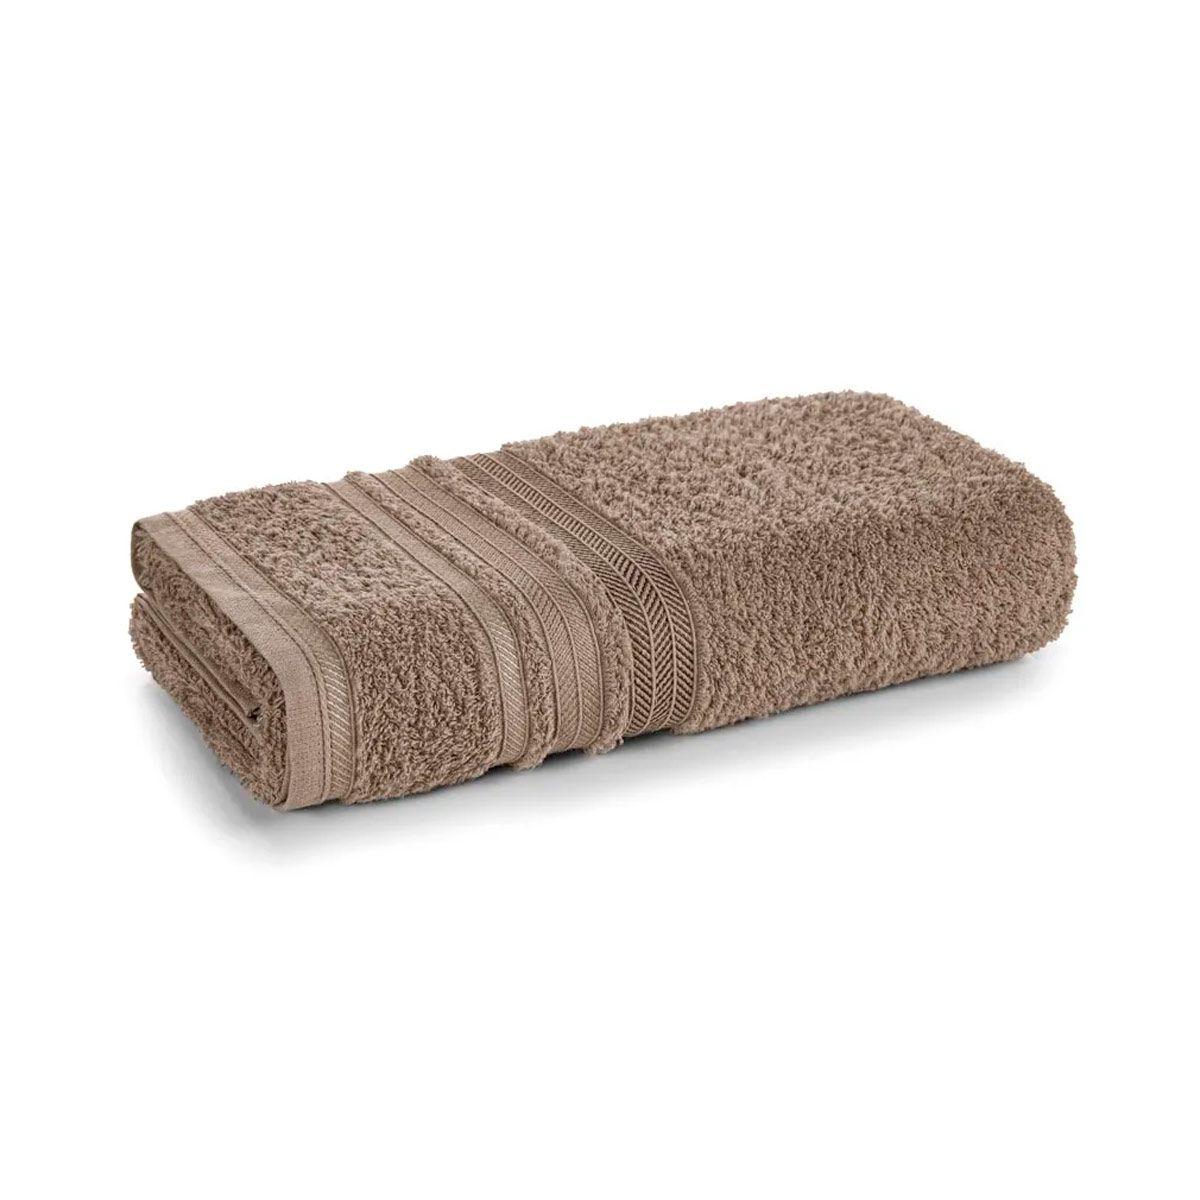 Toalha banho muniz 67x135 Taupe